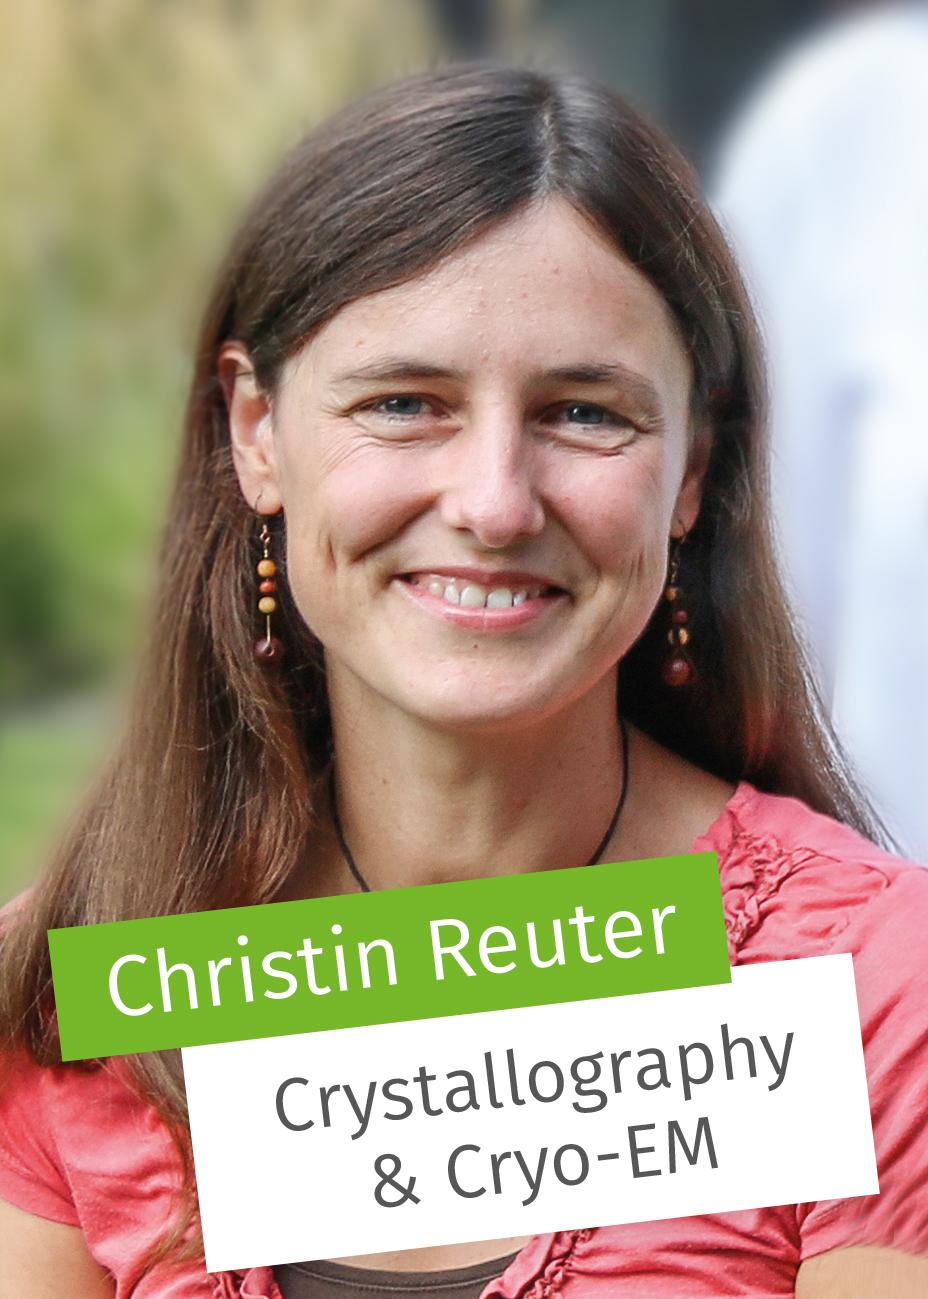 Christin Reuter